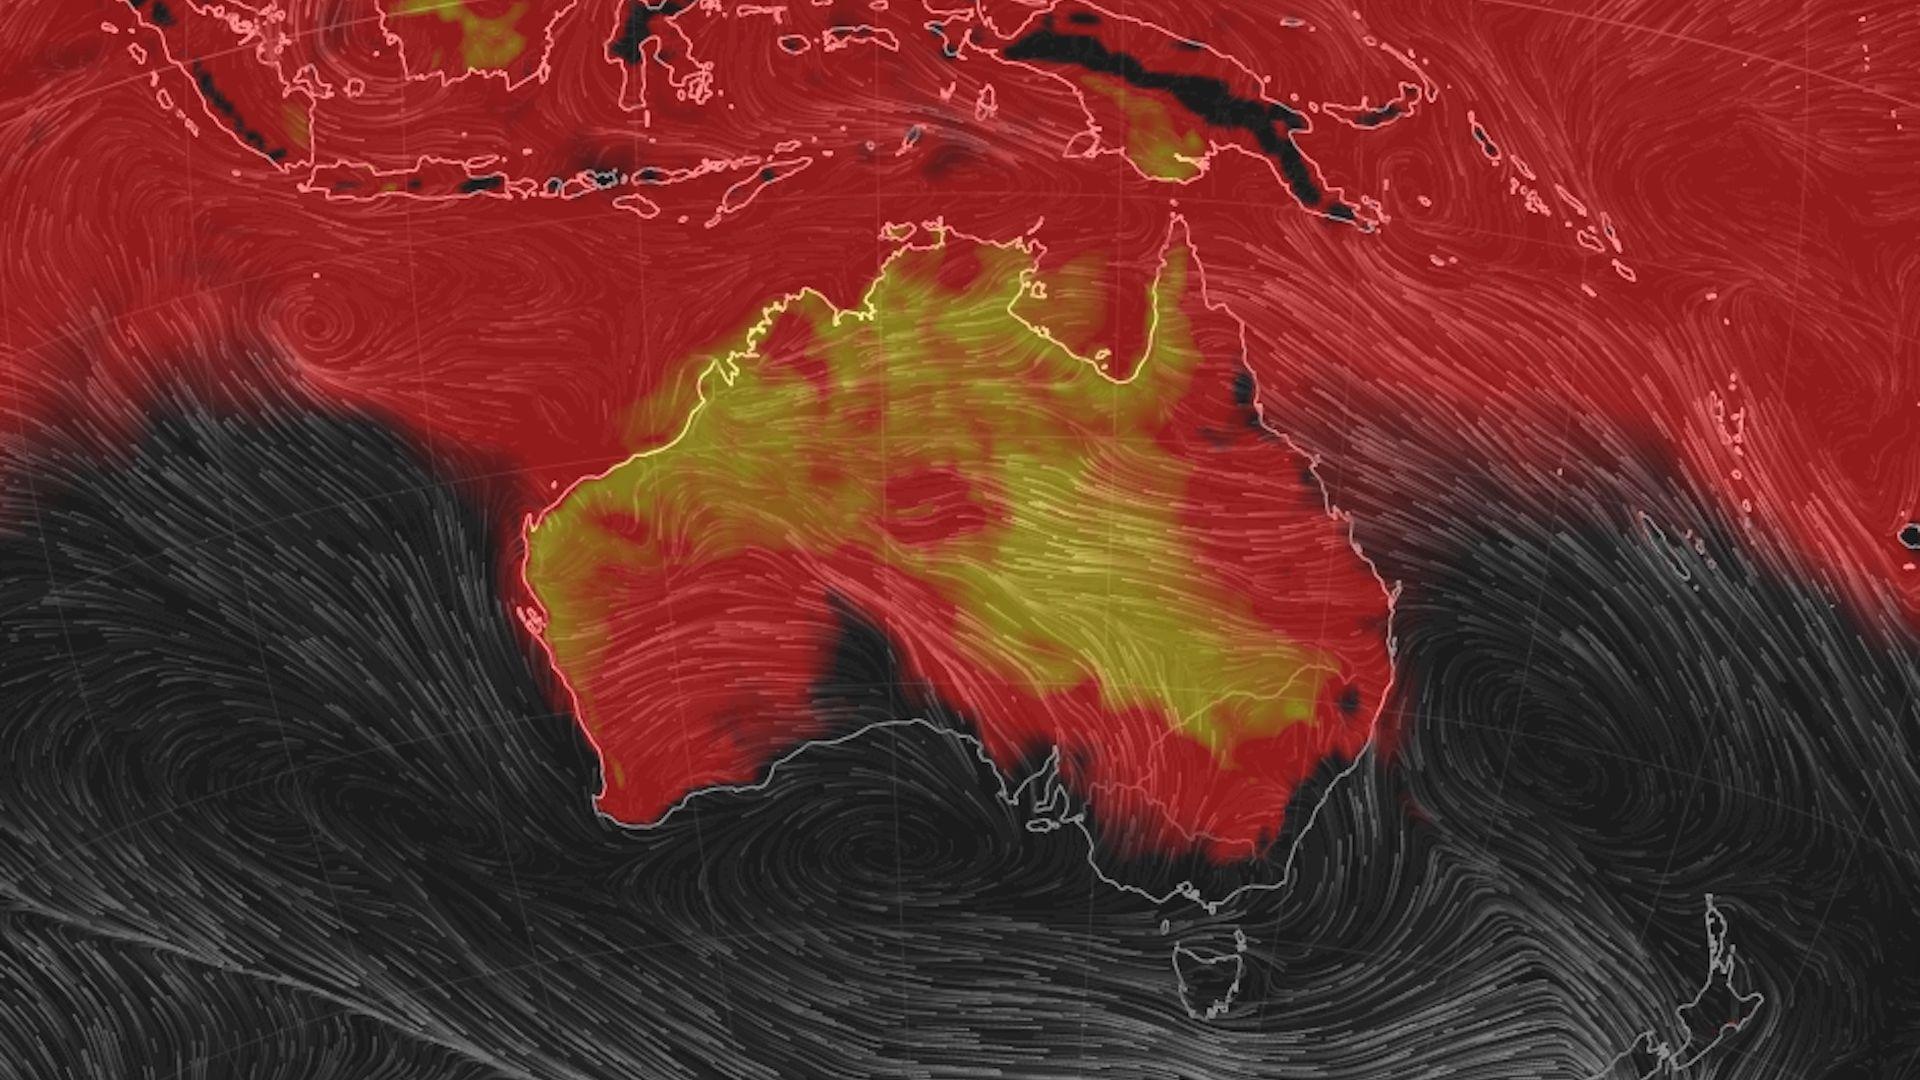 Heat wave projection for Australia on Jan. 19, 2019.